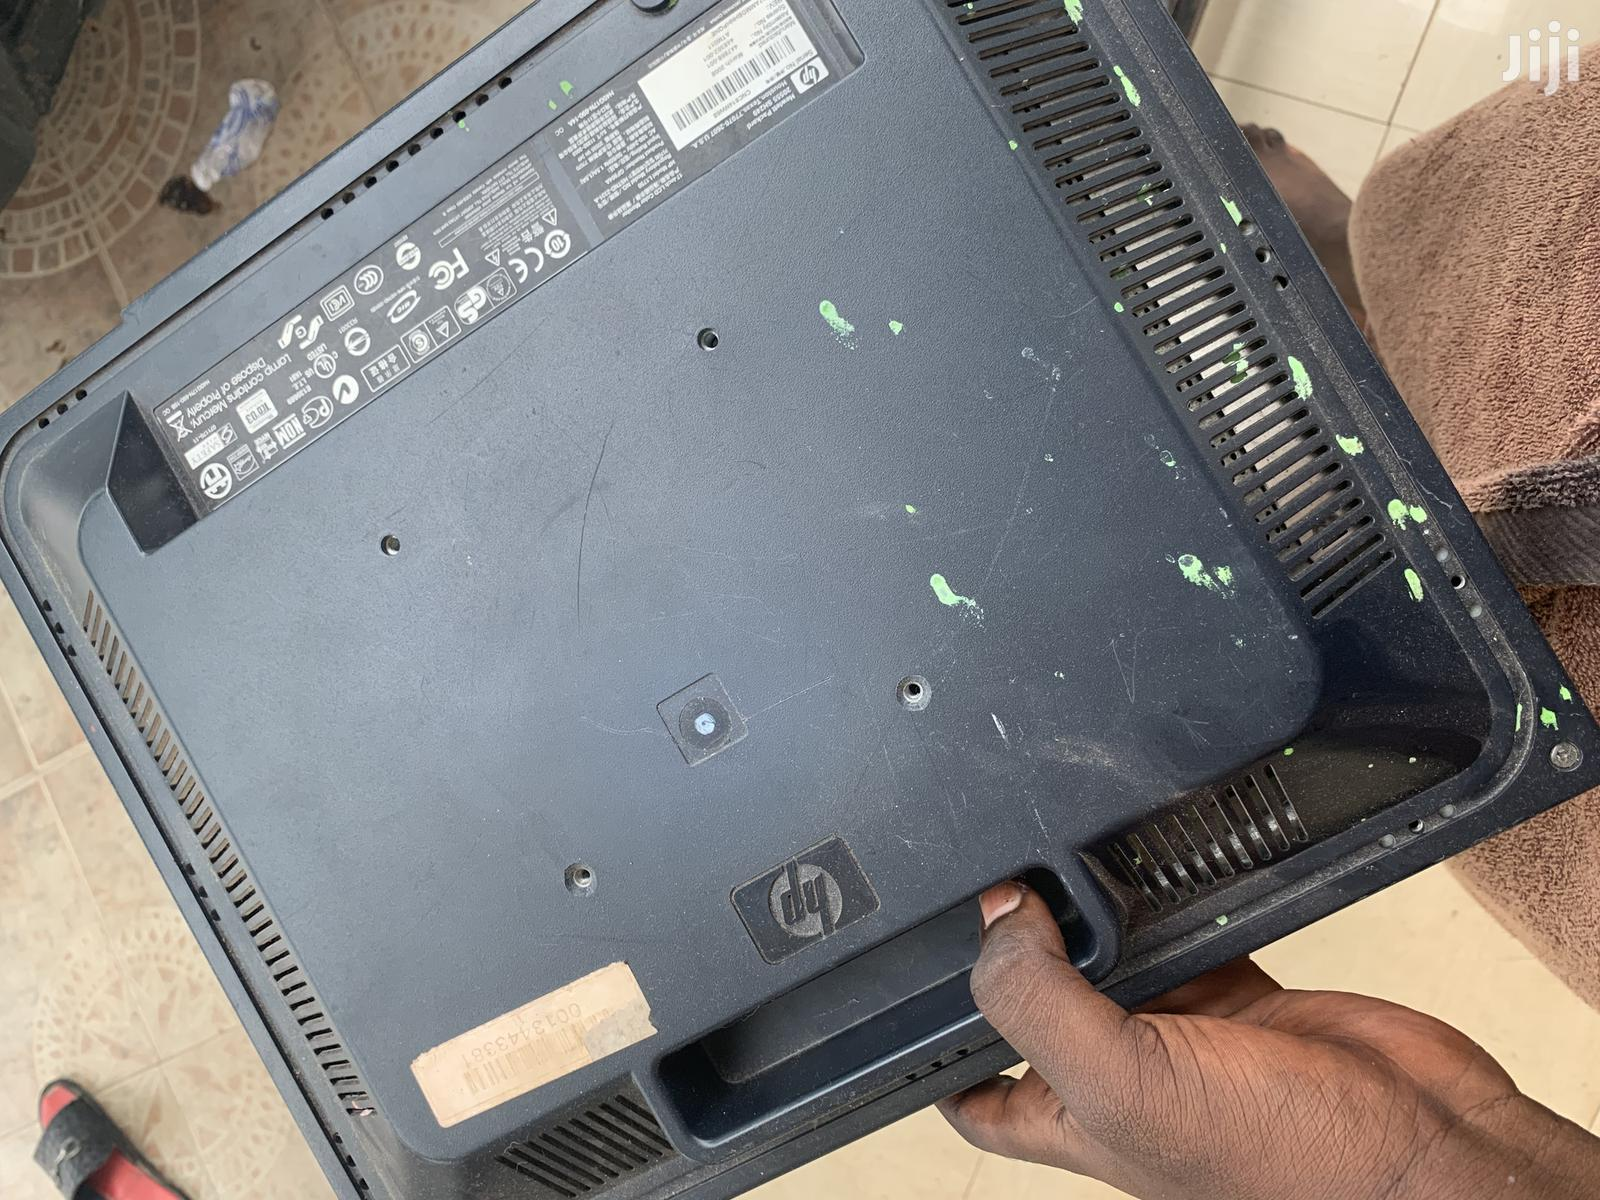 Monitor For Cool Price | Computer Monitors for sale in Atwima Nwabiagya, Ashanti, Ghana